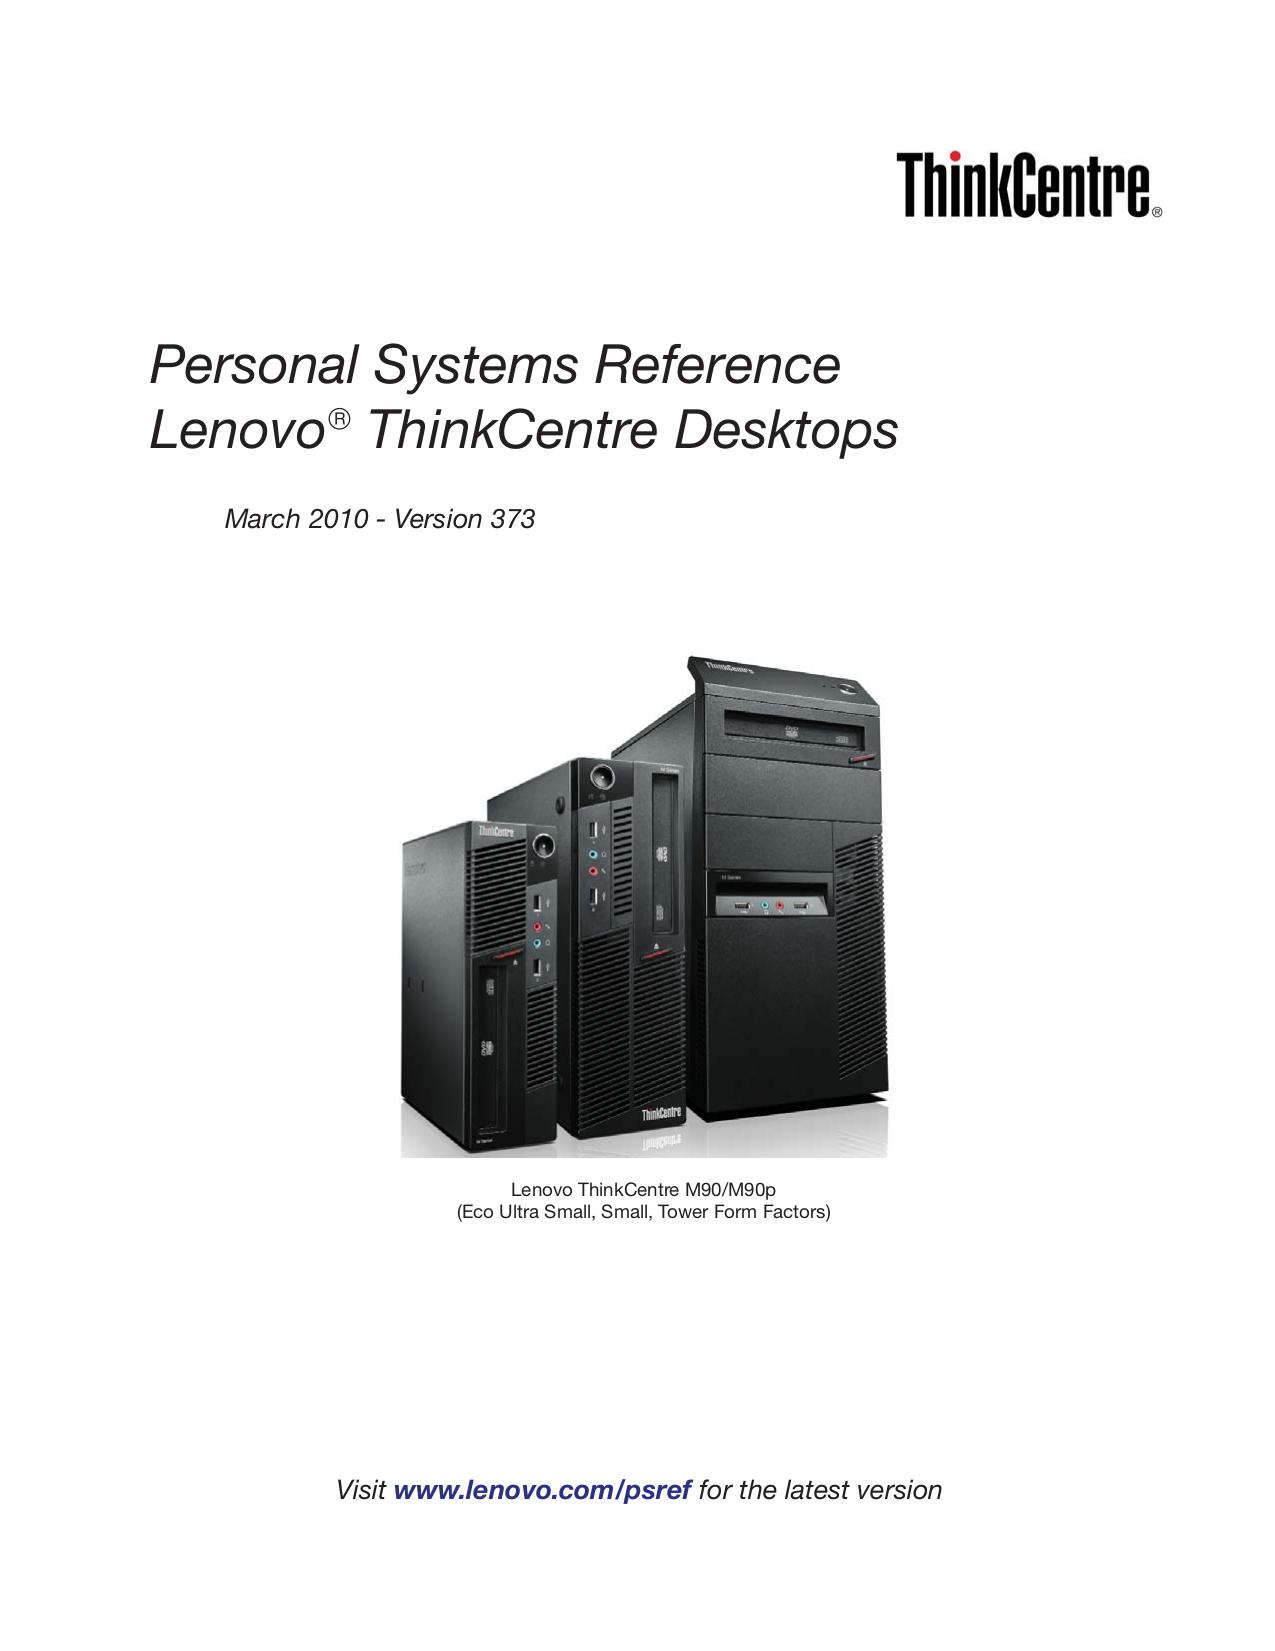 pdf for Lenovo Desktop ThinkCentre M58e 7298 manual